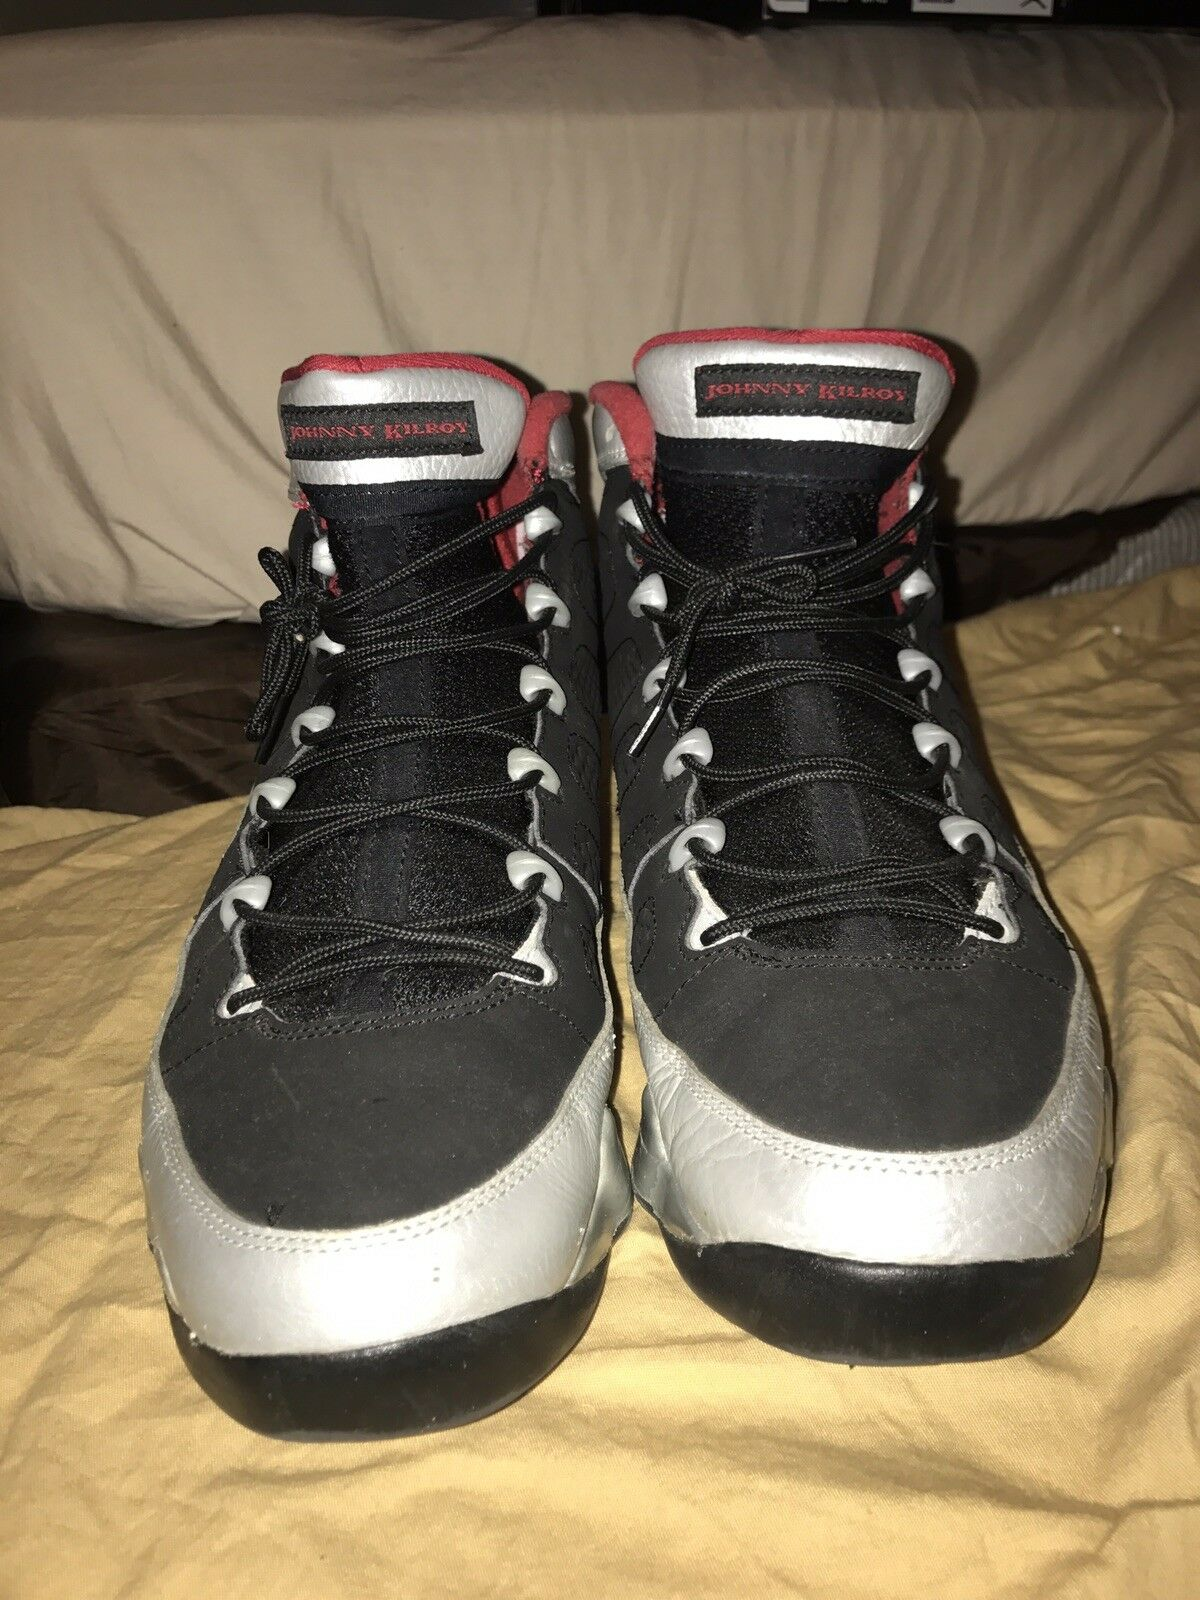 Nike Air Jordan 9 Retro Kilroy Black Red 302370-012 Size 10.5